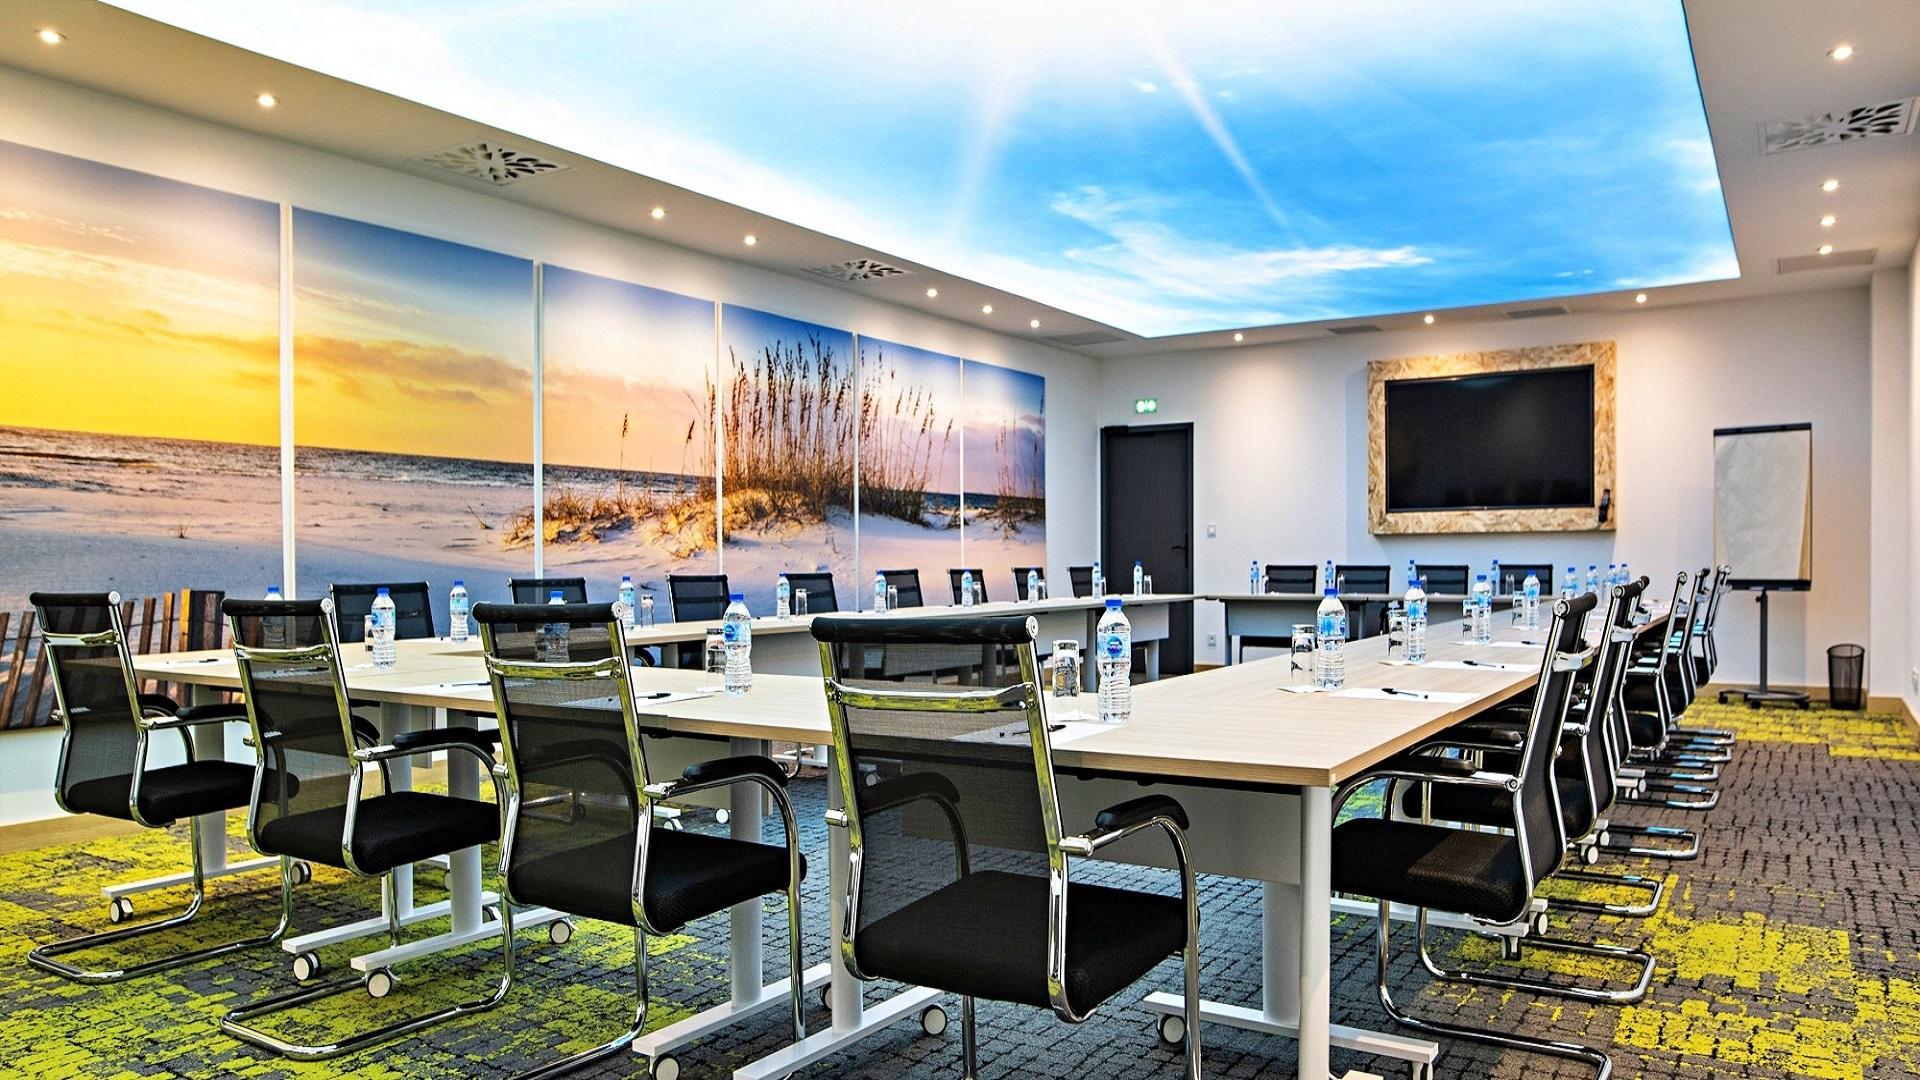 Hotel 1770-avignon-provence-sud-france-meeting-seminaires-de-caractere